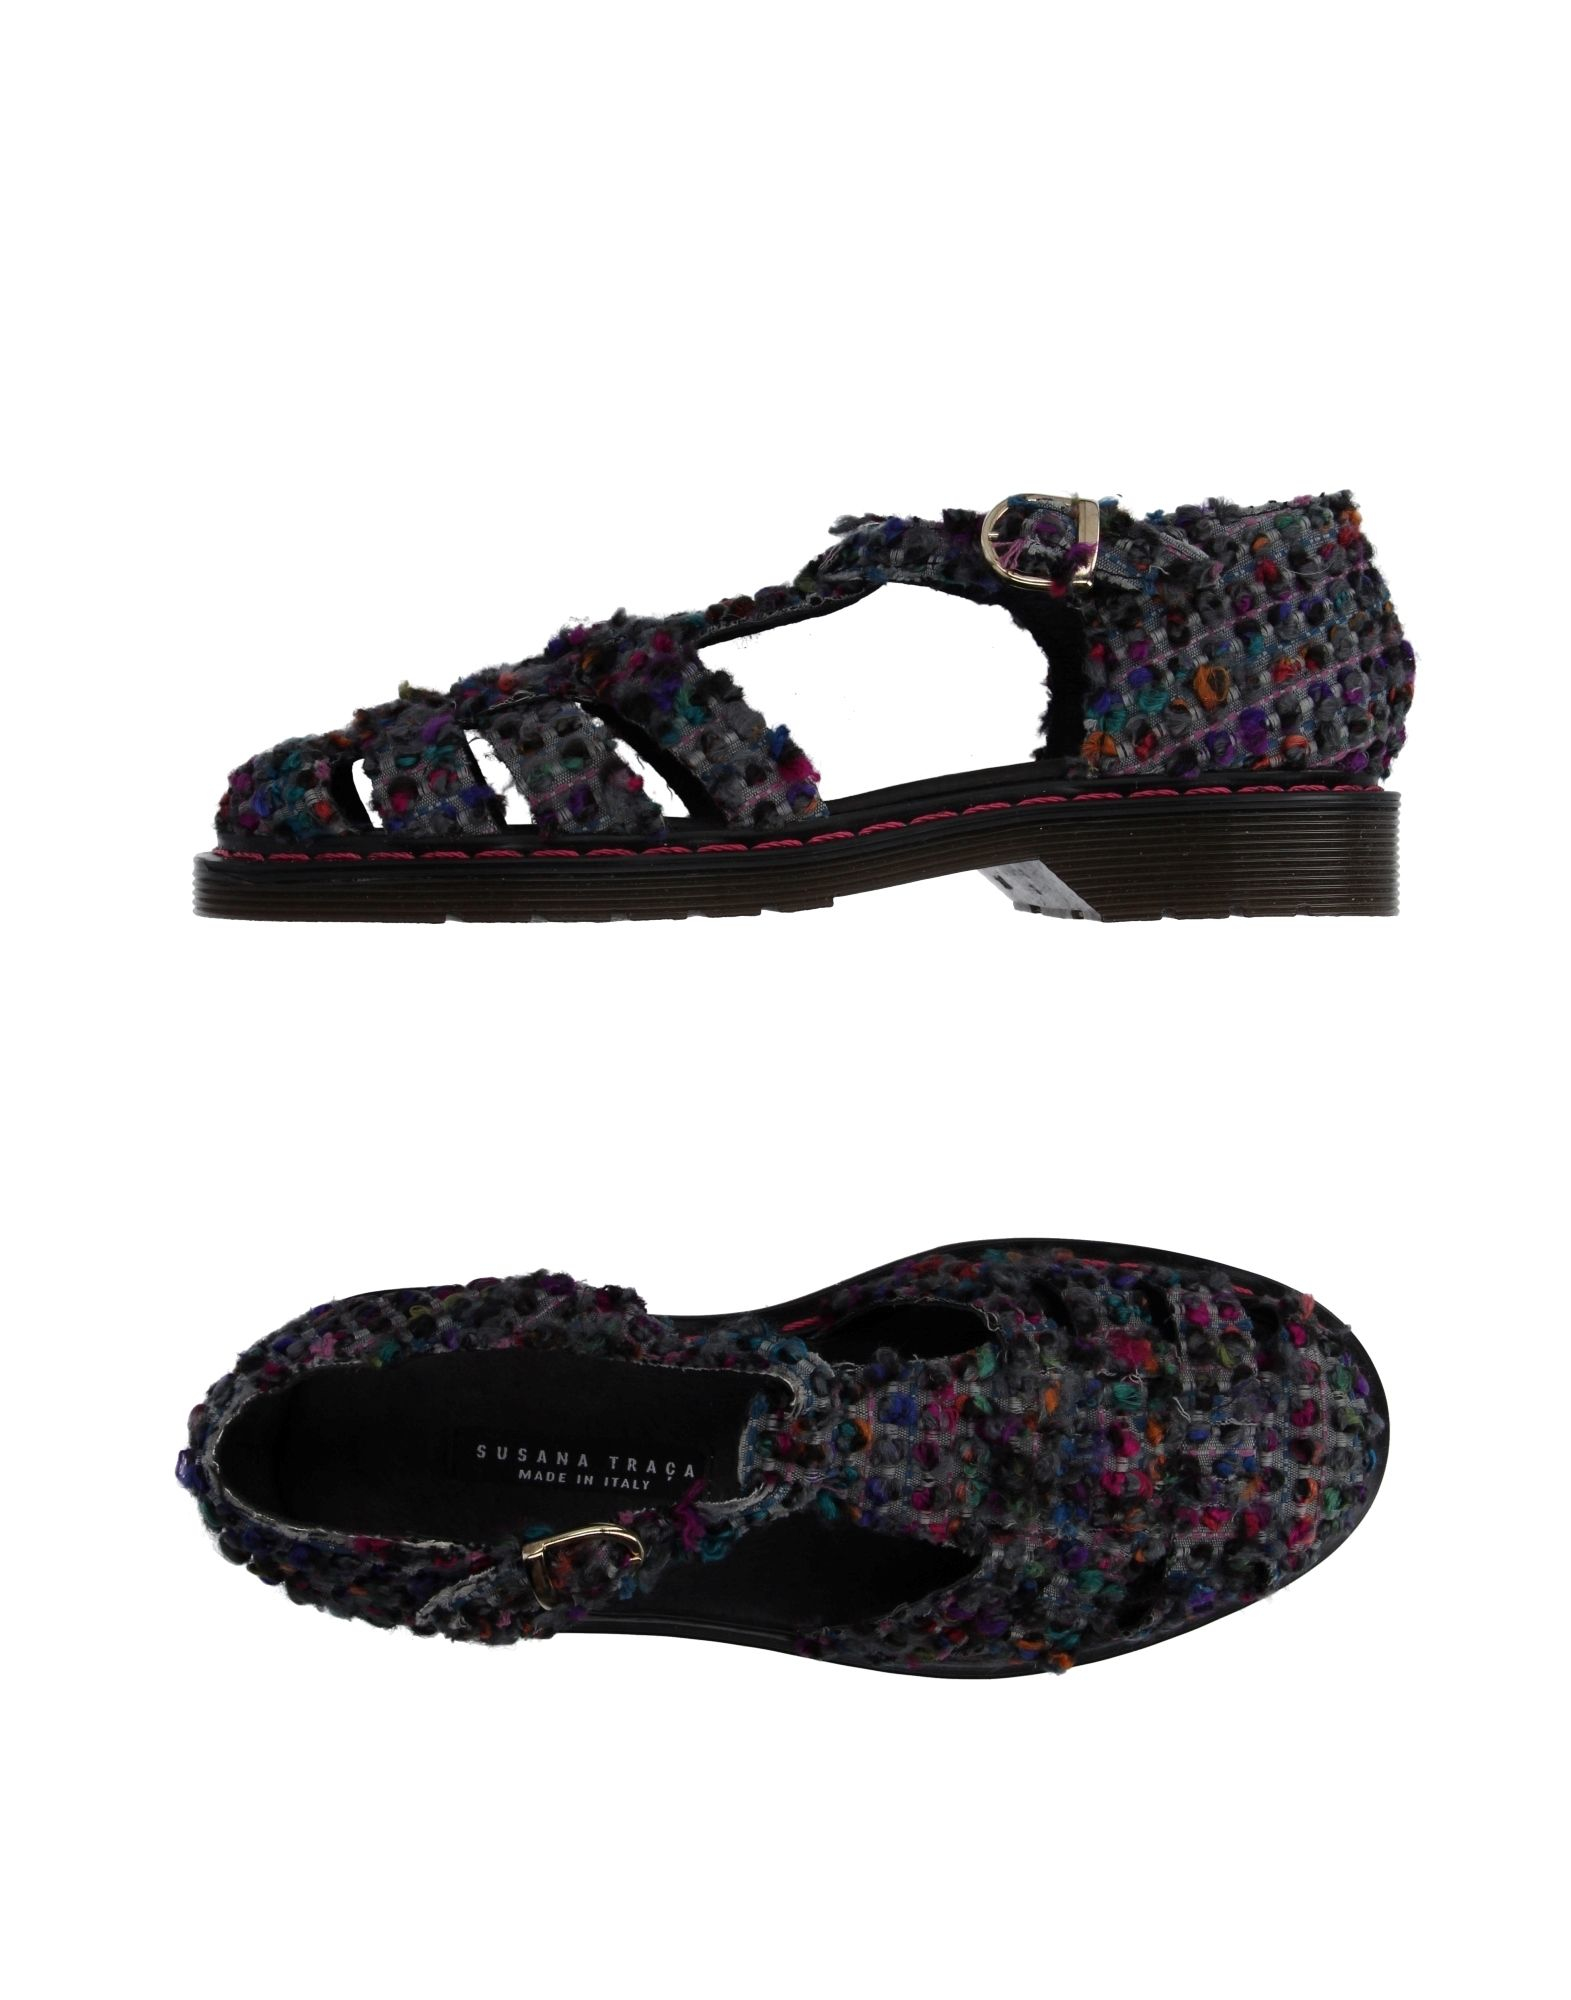 Chaussures - Chaussures À Lacets Susana Tra Une oRHo3